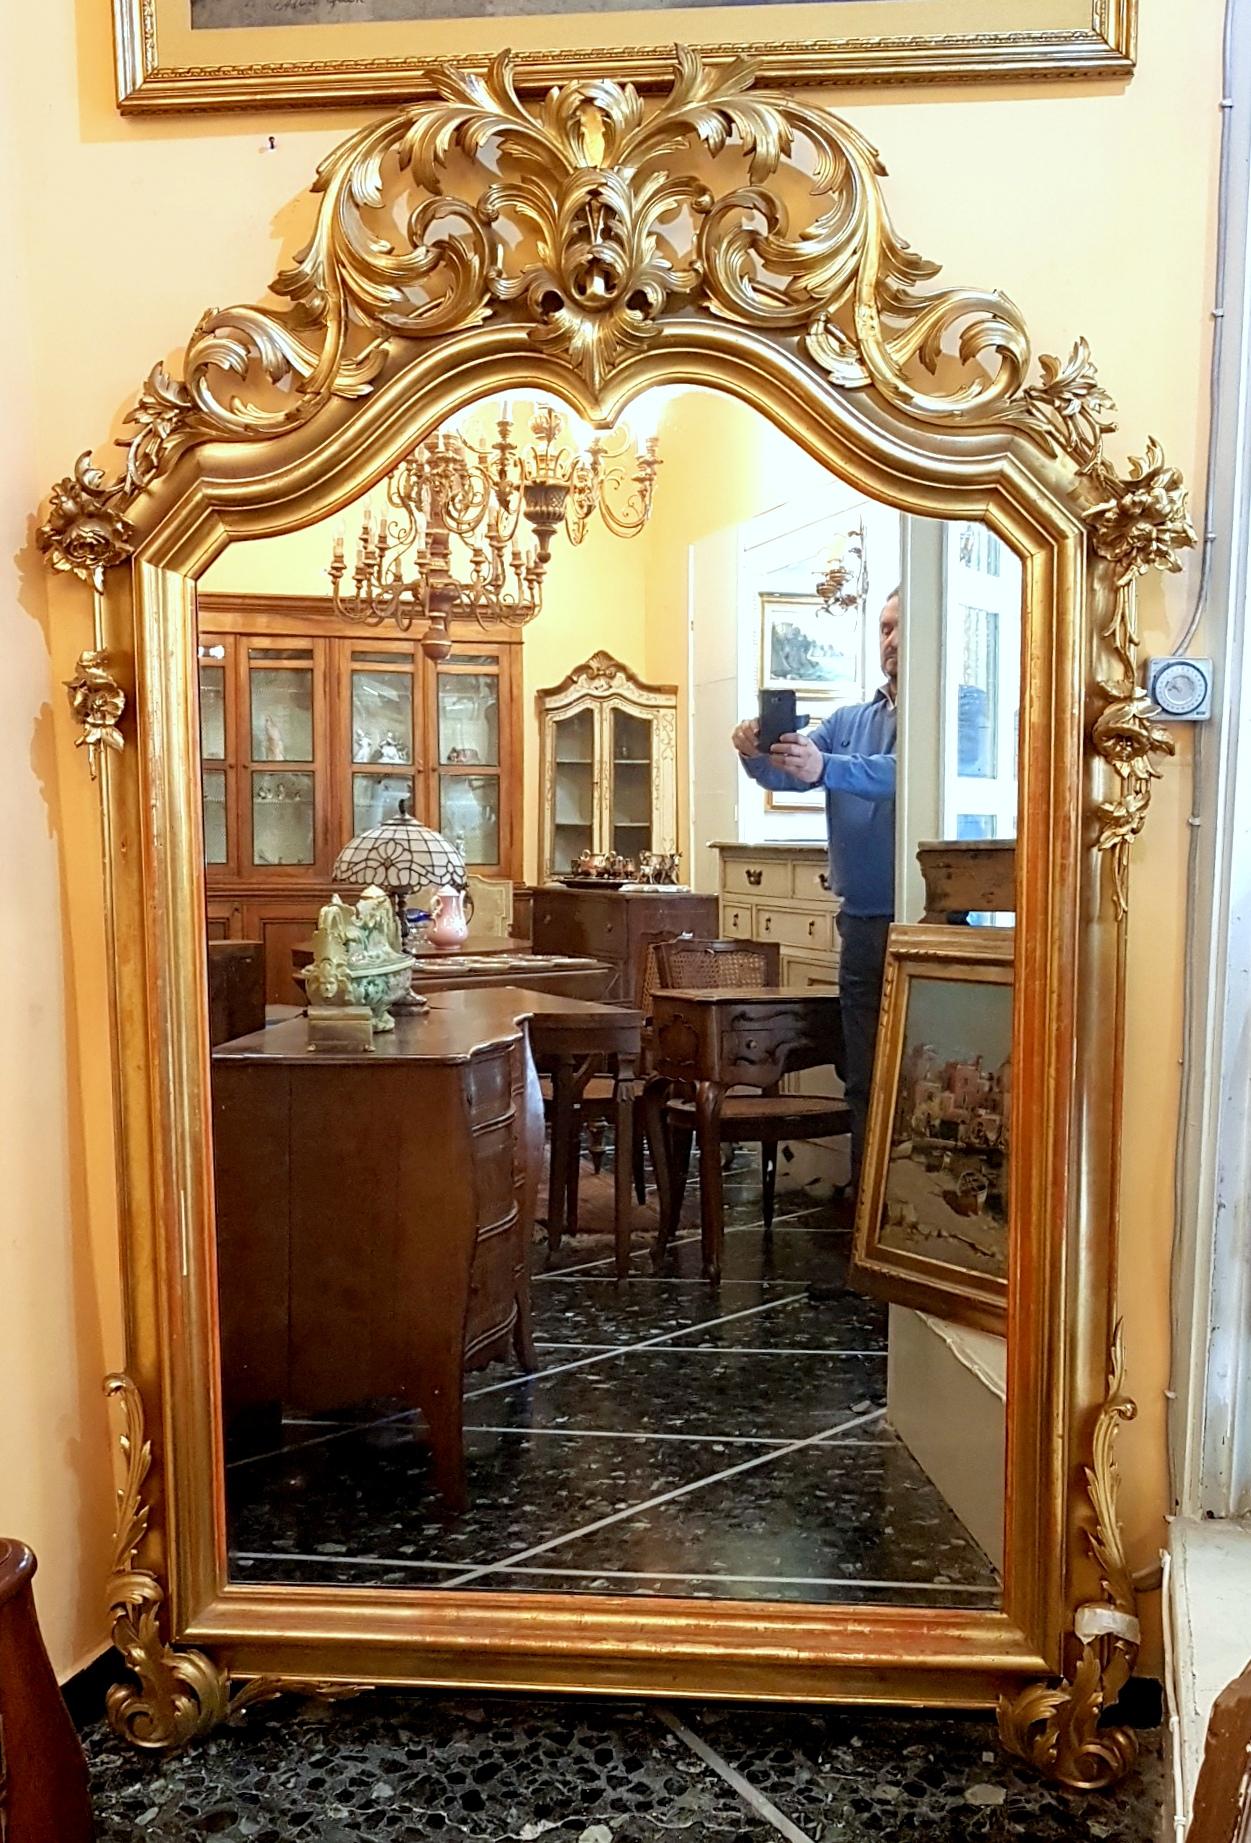 ANTIQUE MIRROR STYLE LUIGI XV EPOCH '800 - GOLD LEAF | Antiques ...